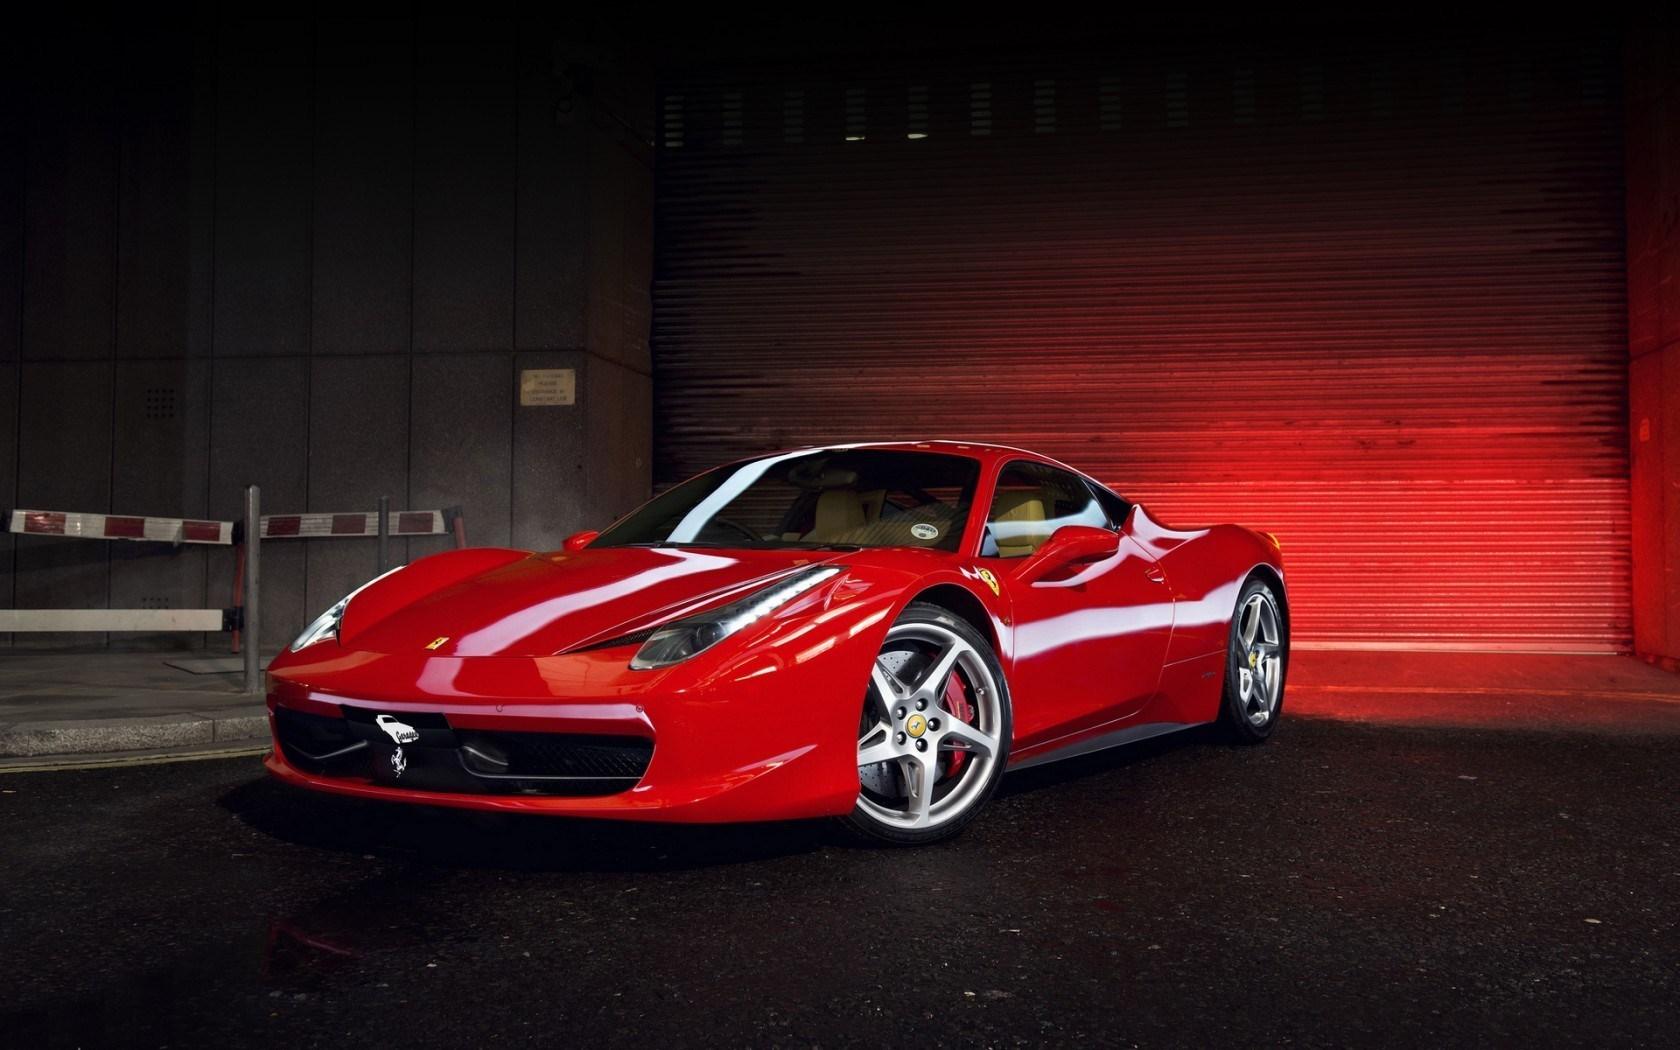 Ferrari 458 Italia 16 Cool HD Wallpaper